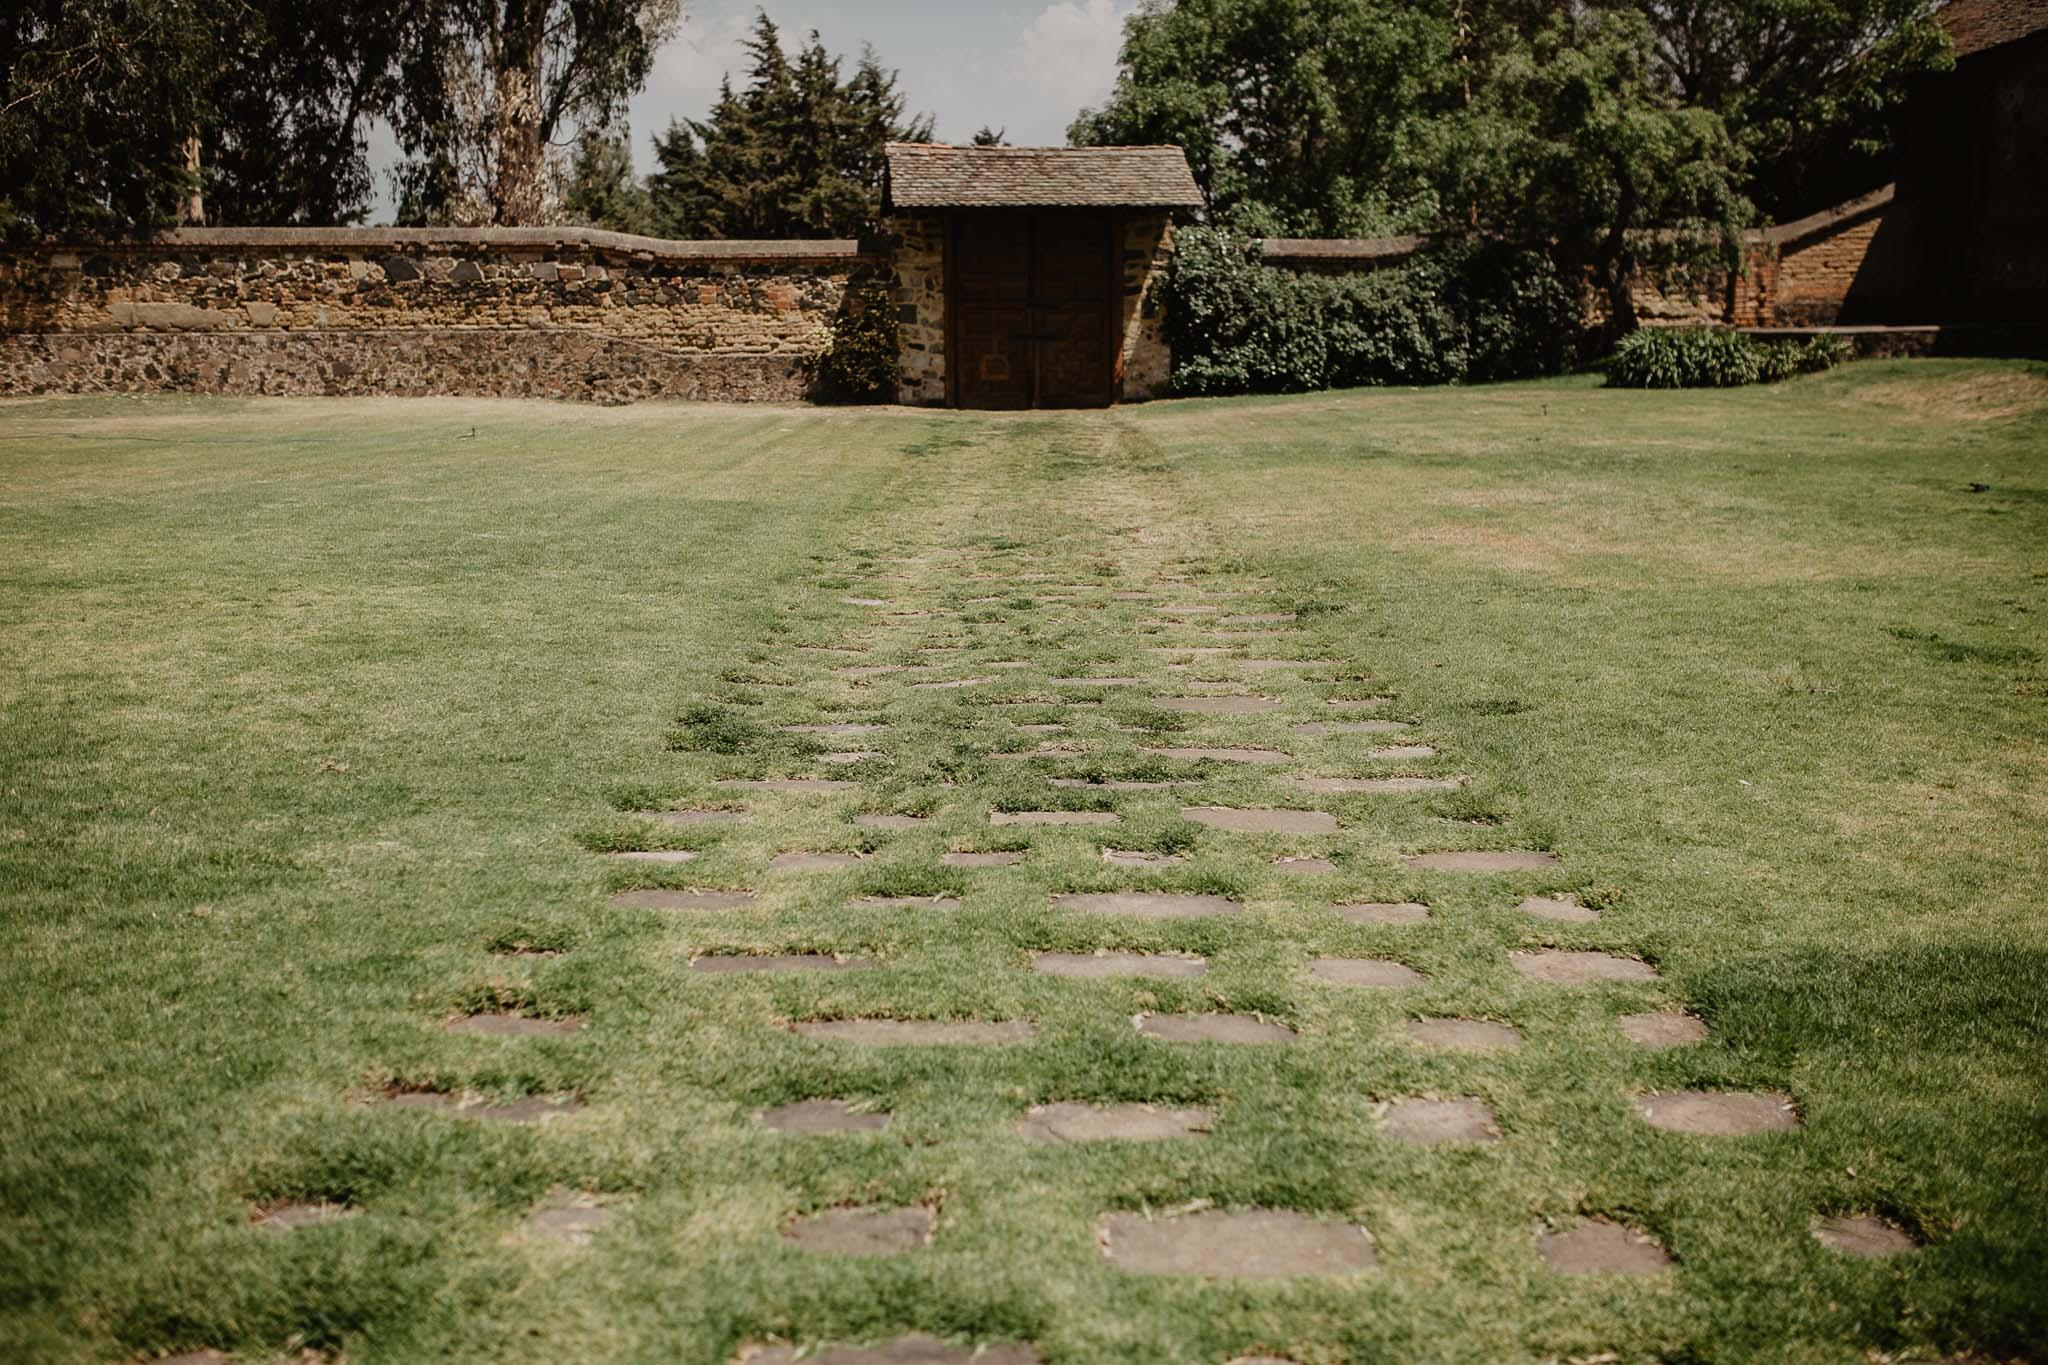 hacienda-san-andres-IMG_7073 (1).jpg